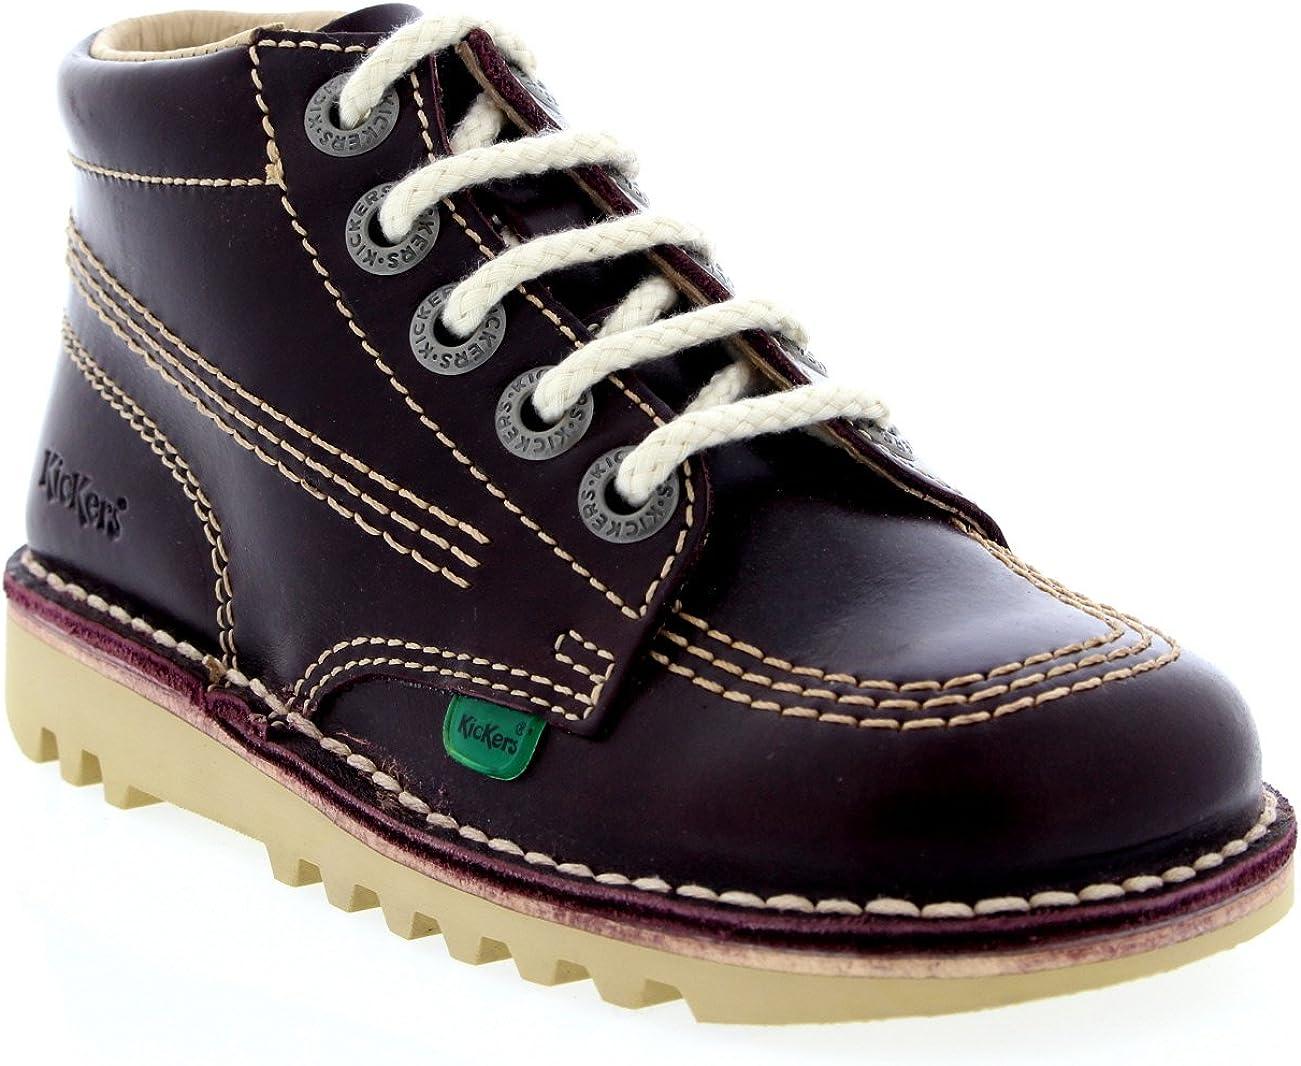 Womens Kickers Kick Work Leather Platform Hi Patent Boot Laced Shoes 71atBWDzNdL